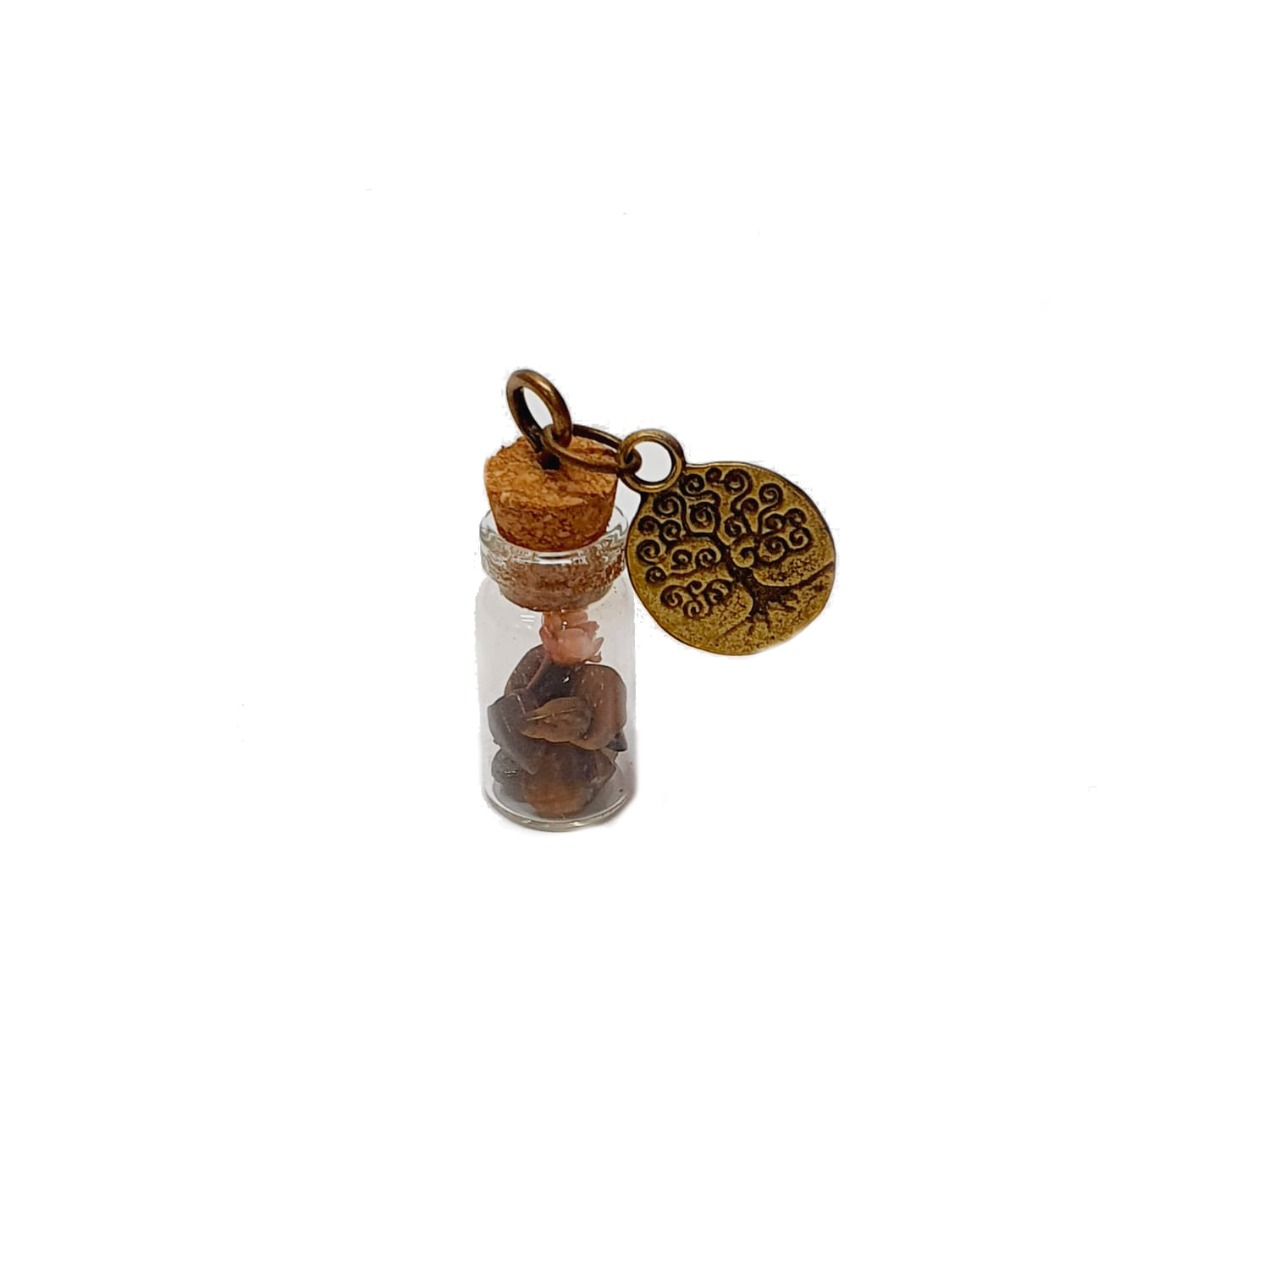 Amuleto de Pedra Natural Olho de Tigre